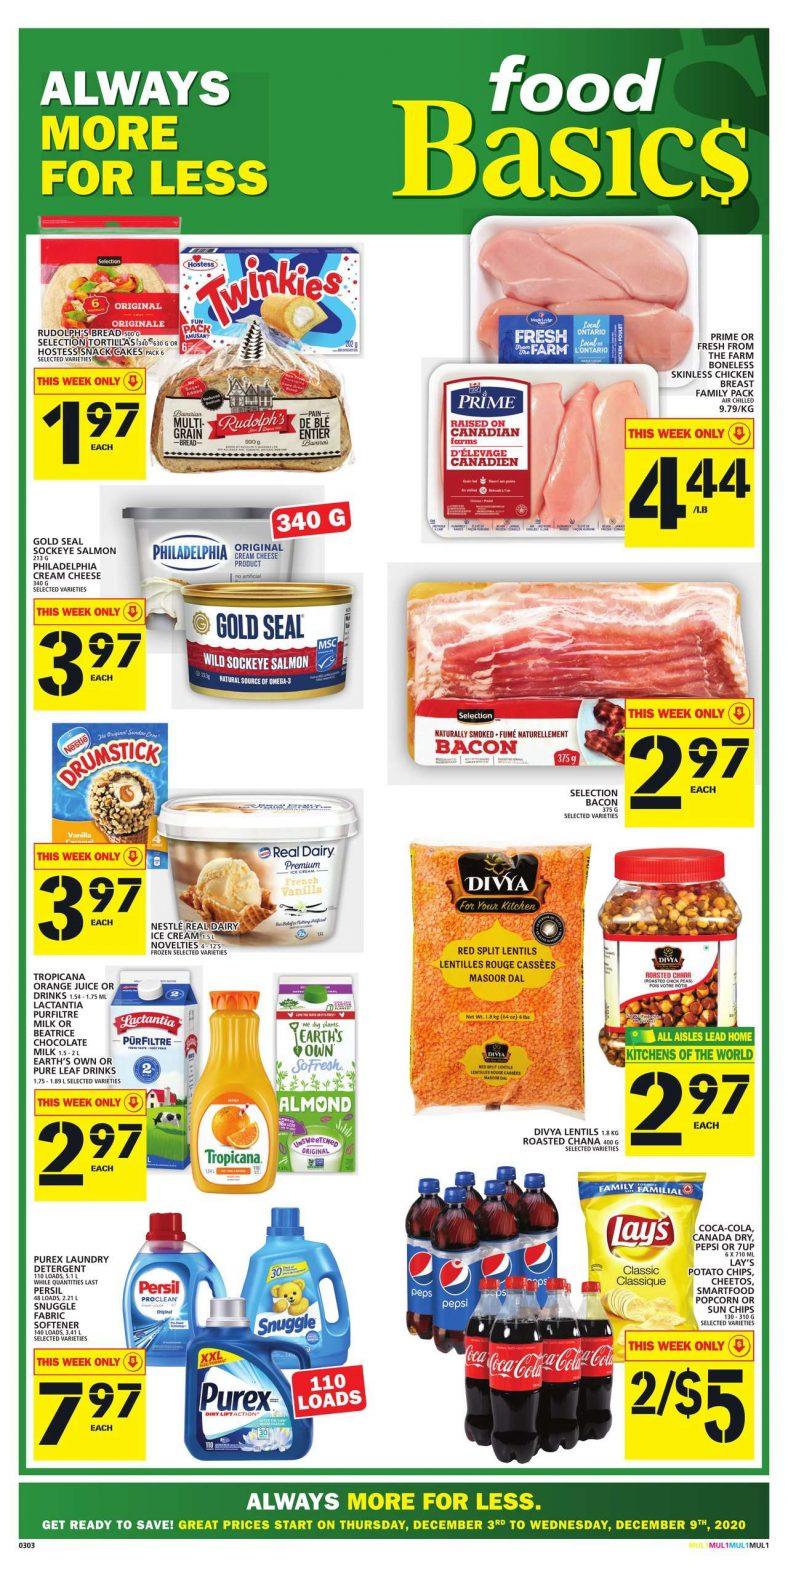 01 Food Basics Flyer December 3 December 9 2020